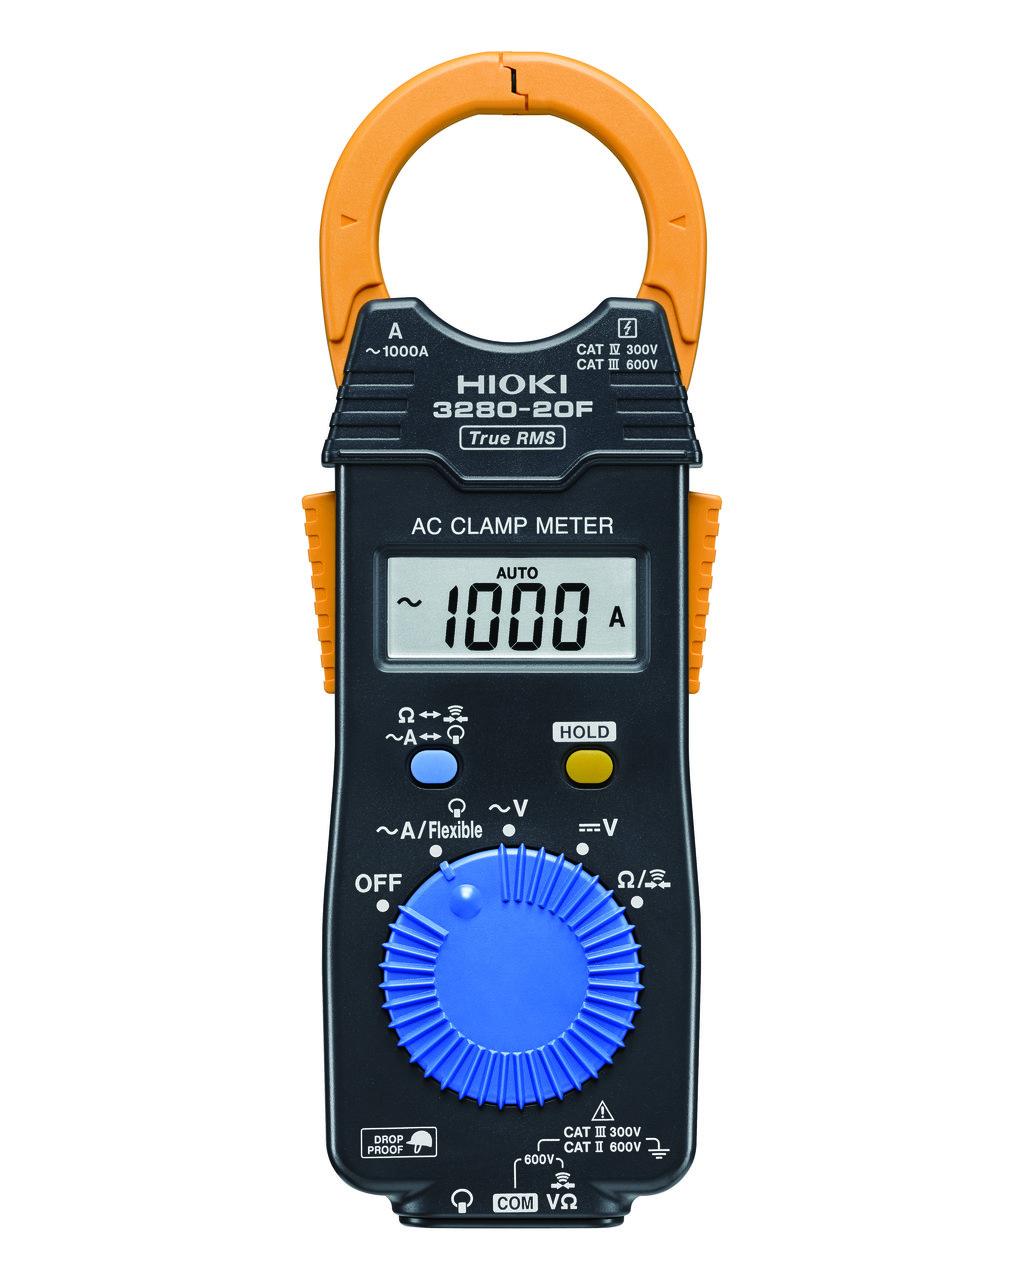 3280-20F - Alicate amperímetro AC, 1000V